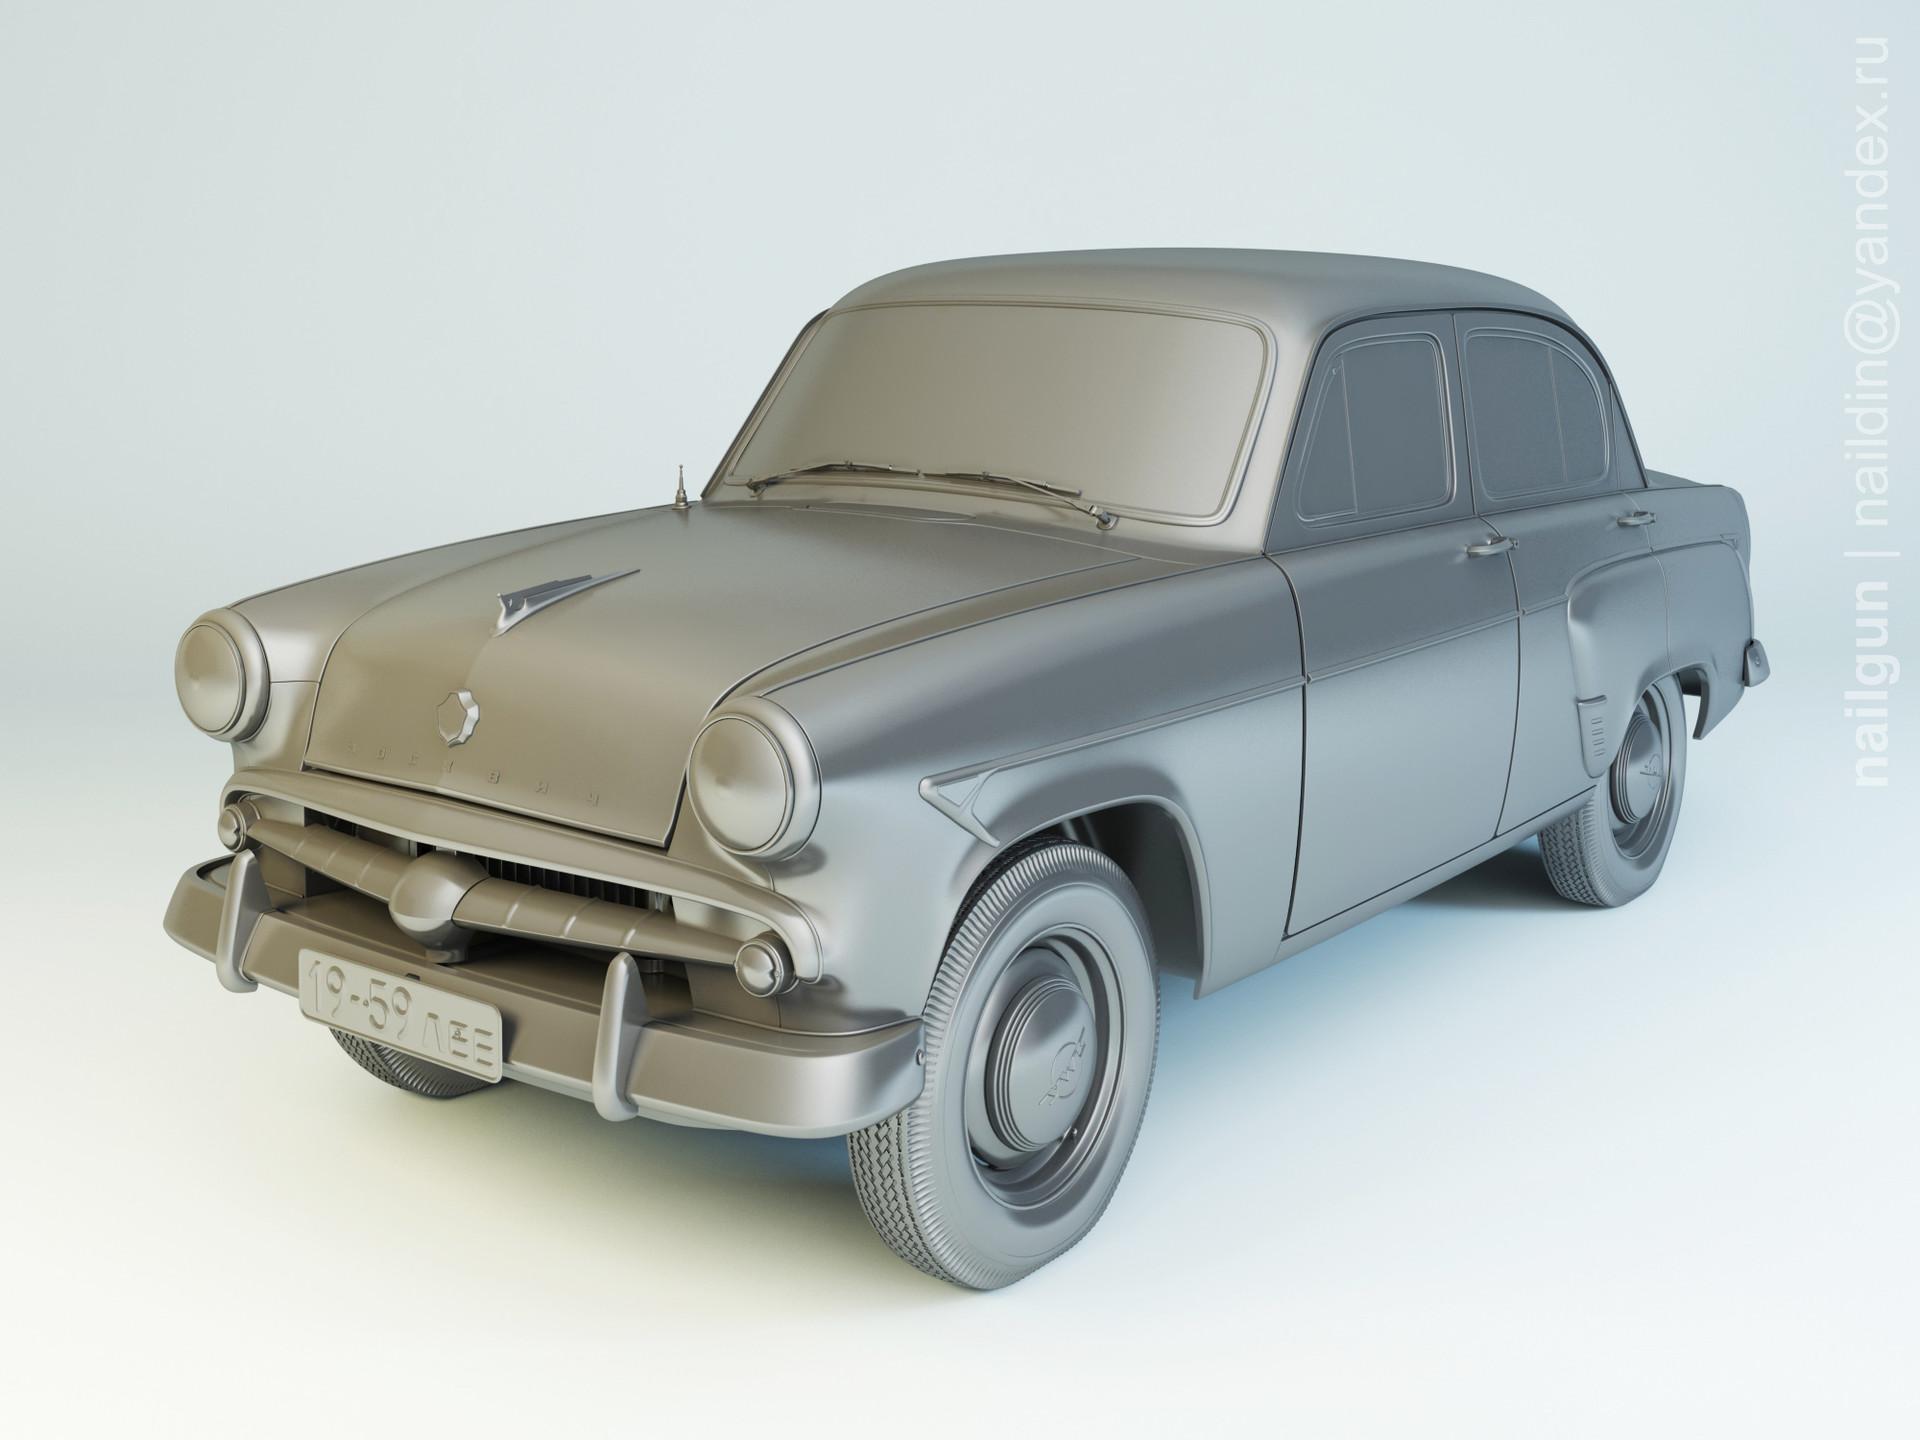 Nail khusnutdinov als 204 000 moskvich 407 1959 modelling 0